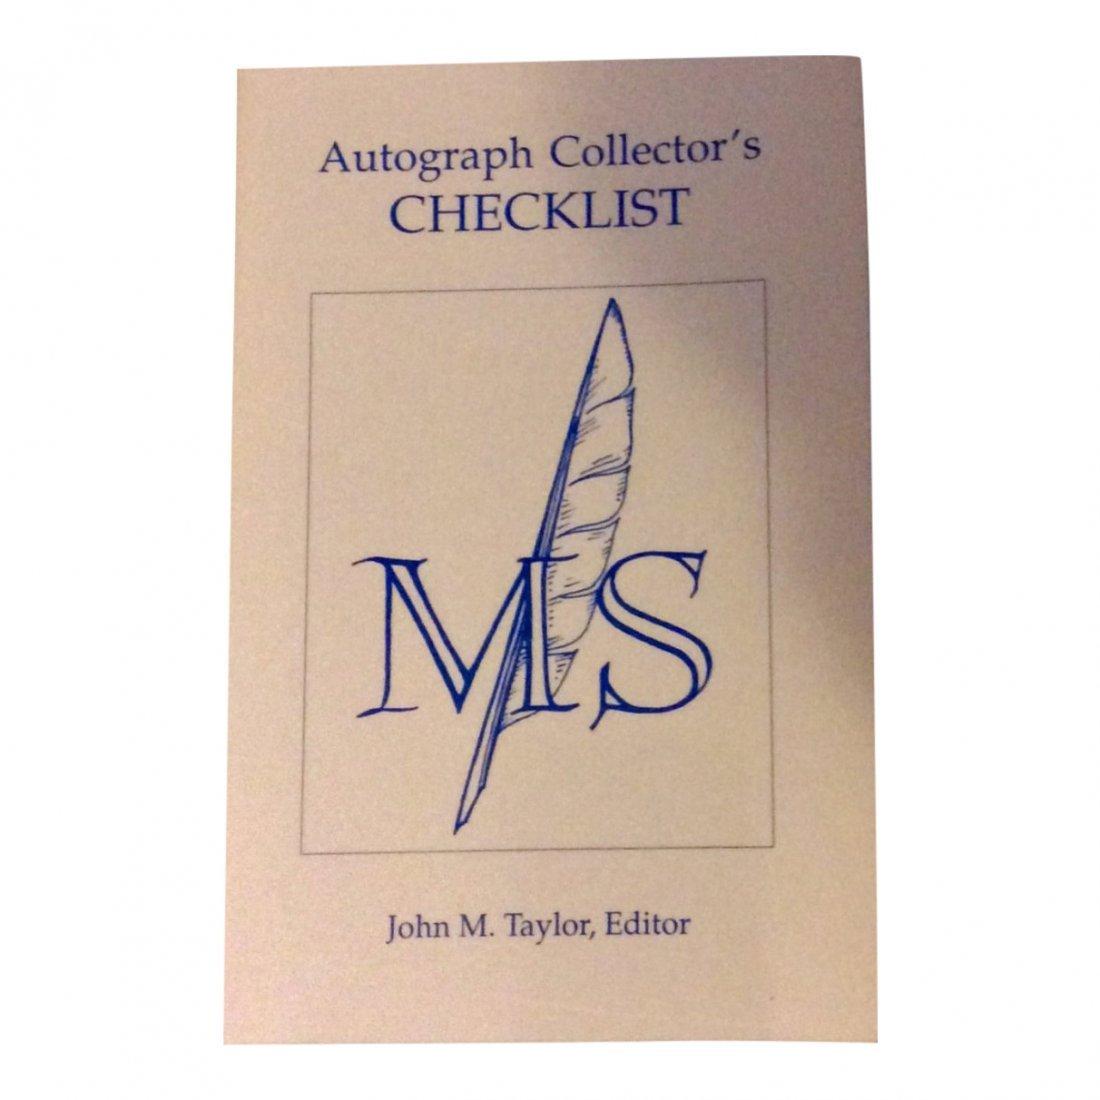 Autograph Collector's Checklist, 1990